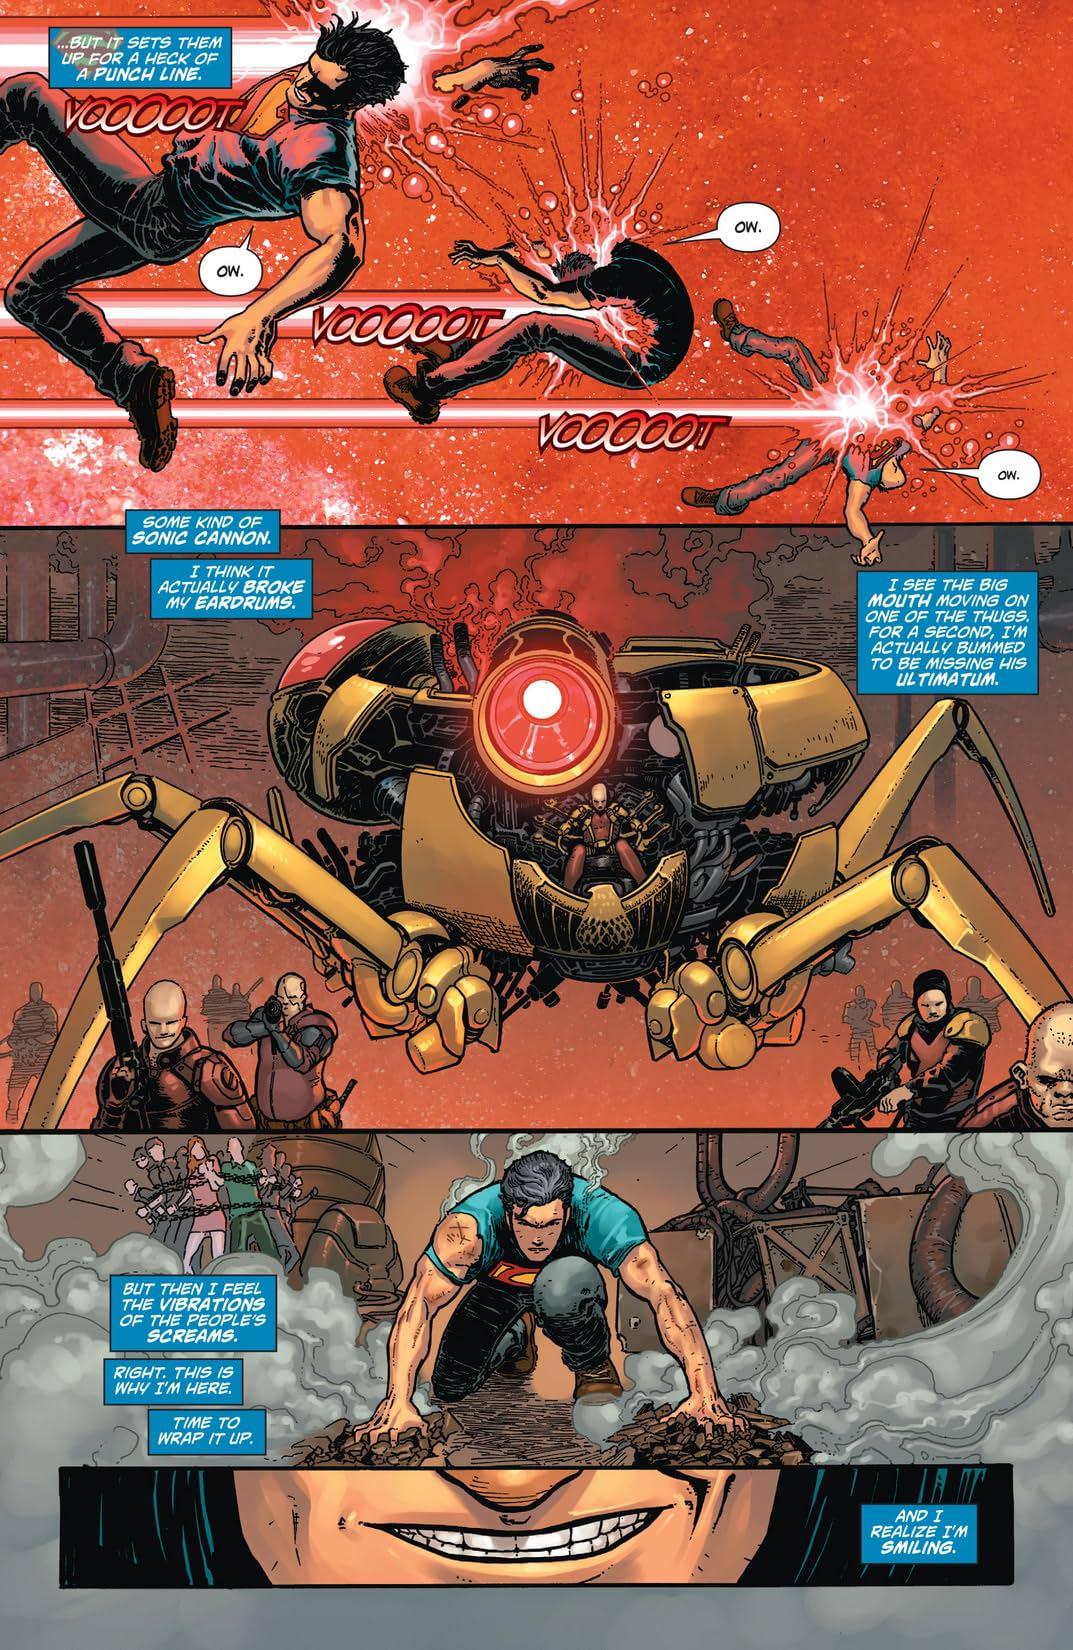 Action Comics (2011-) #25